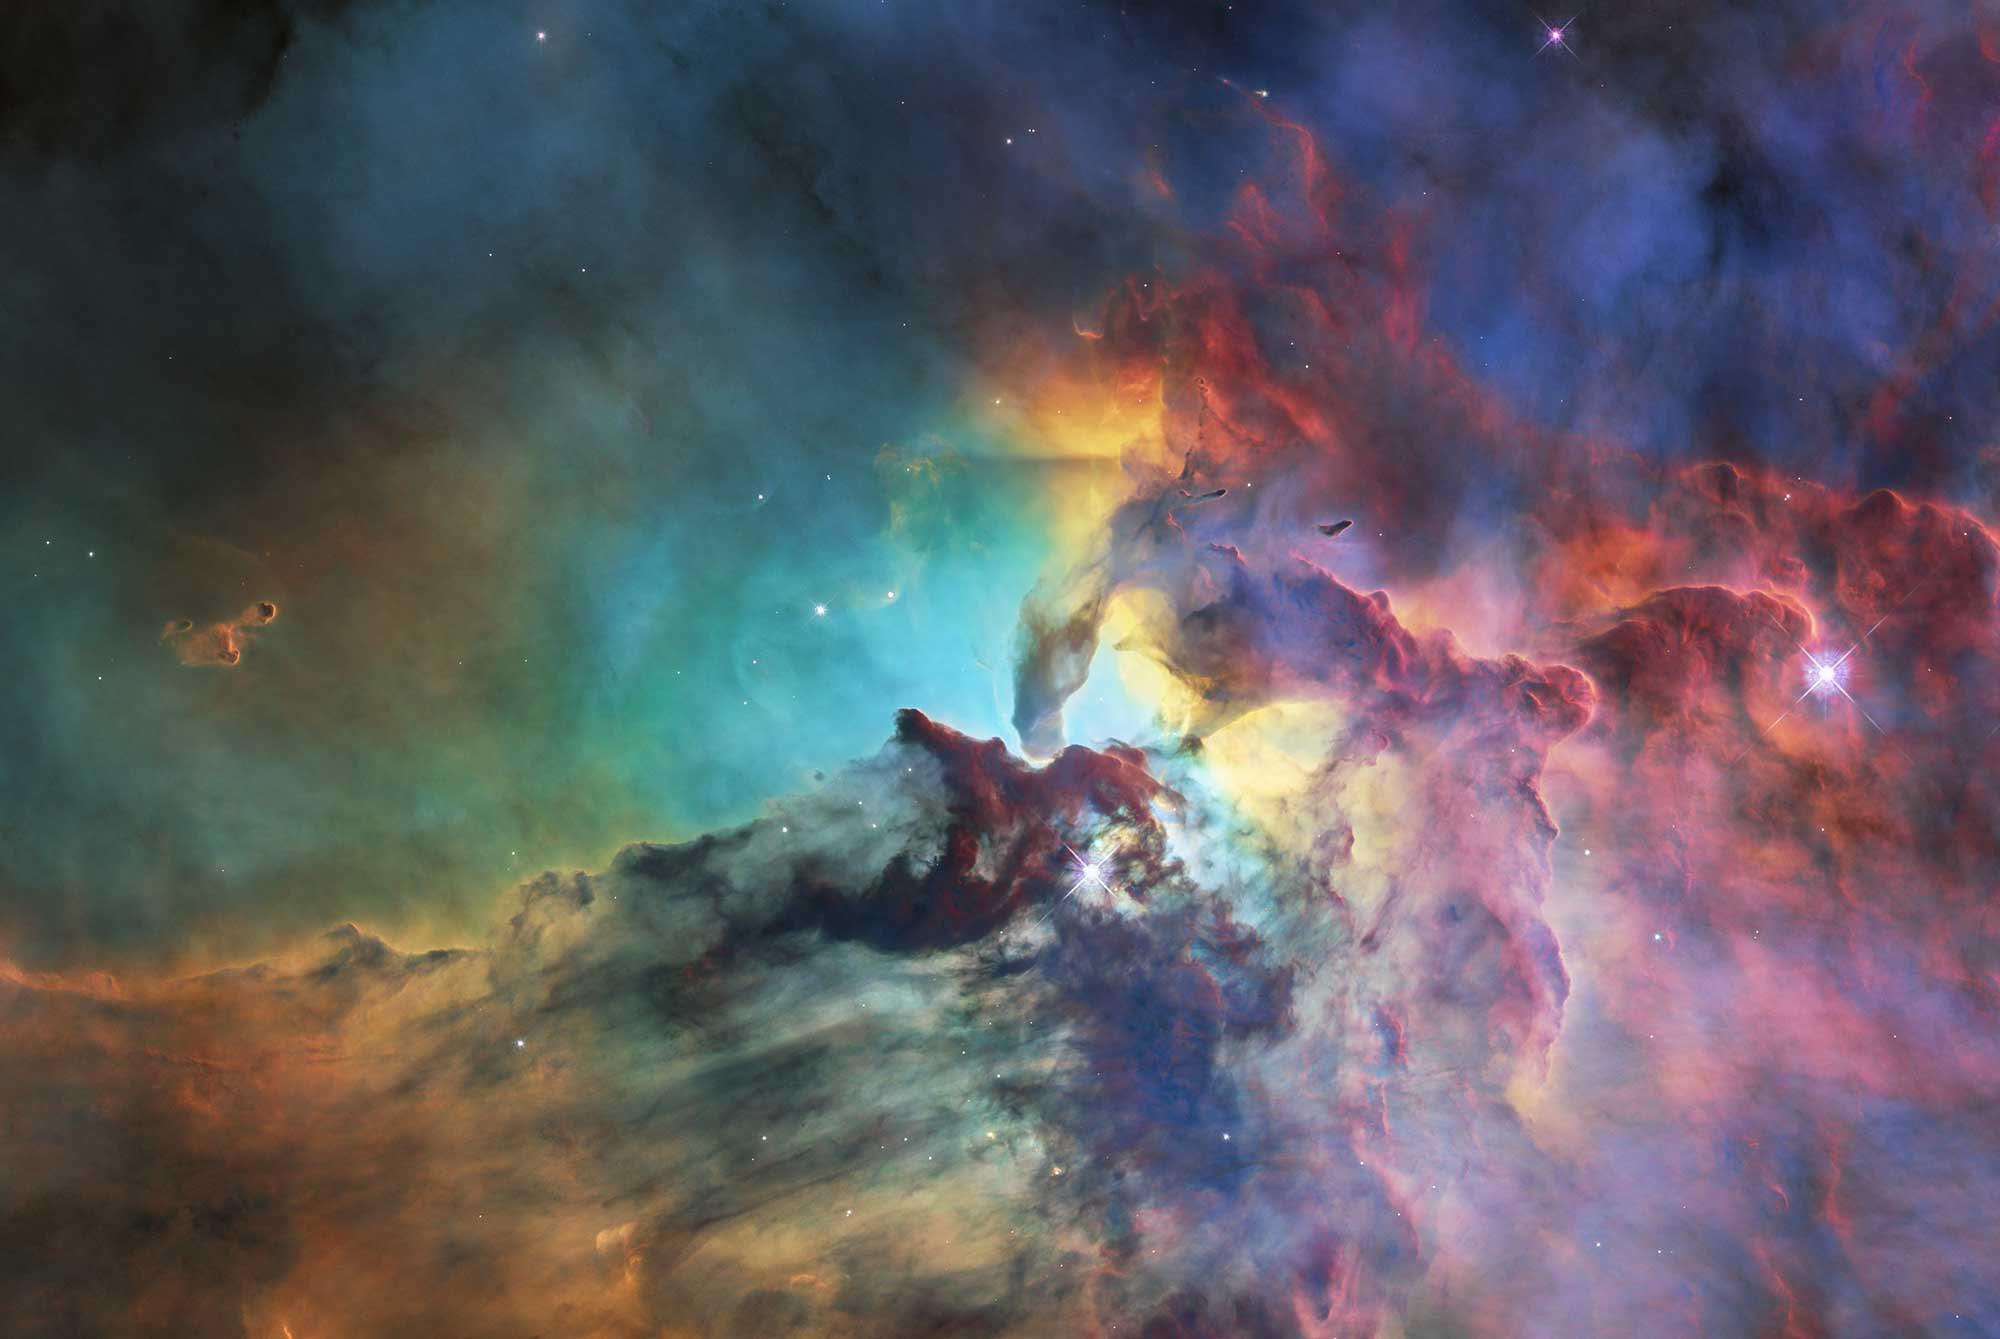 2018 hubble space telescope